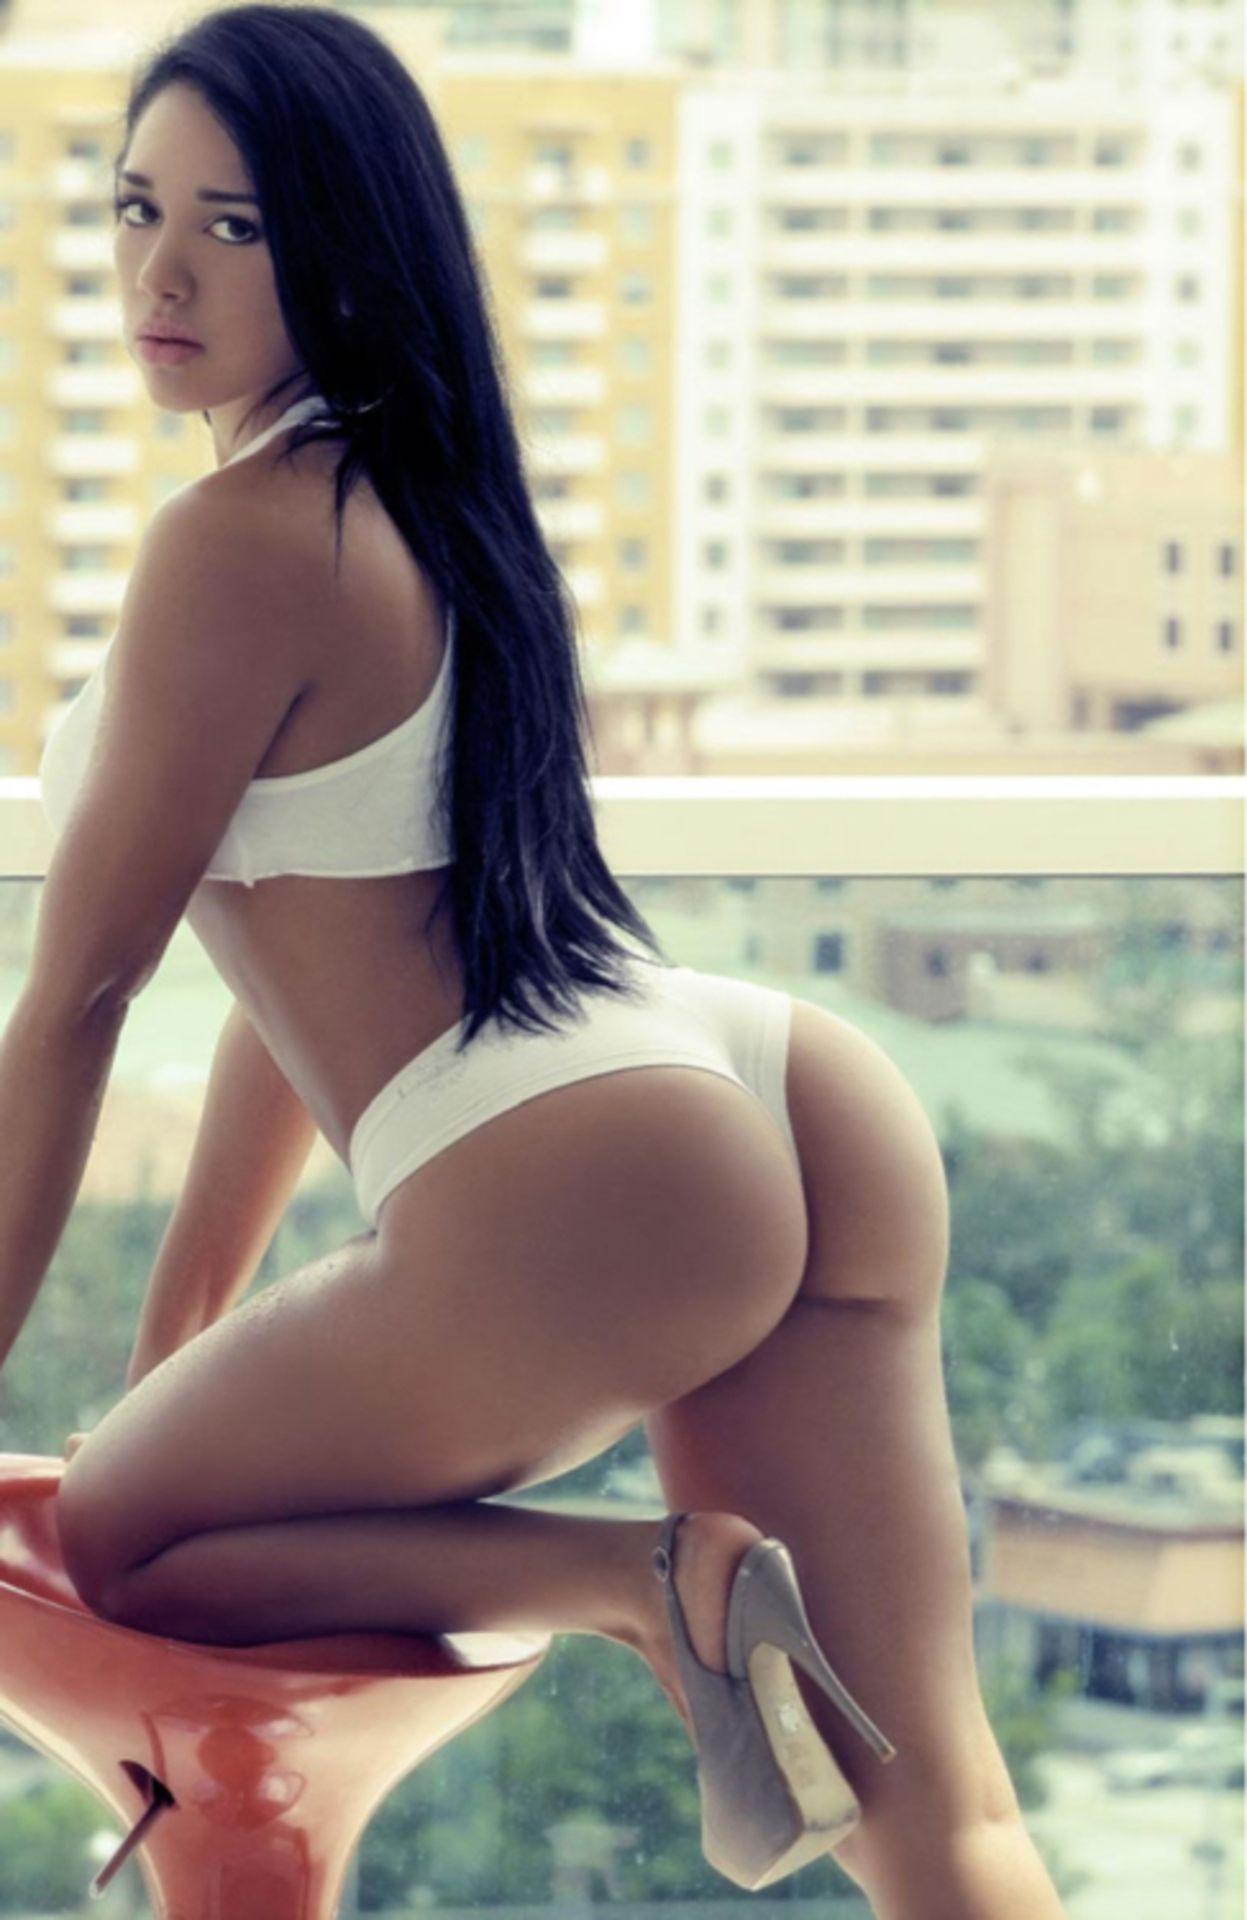 Ass Andrea Calle nude (57 photos), Tits, Sideboobs, Boobs, lingerie 2018